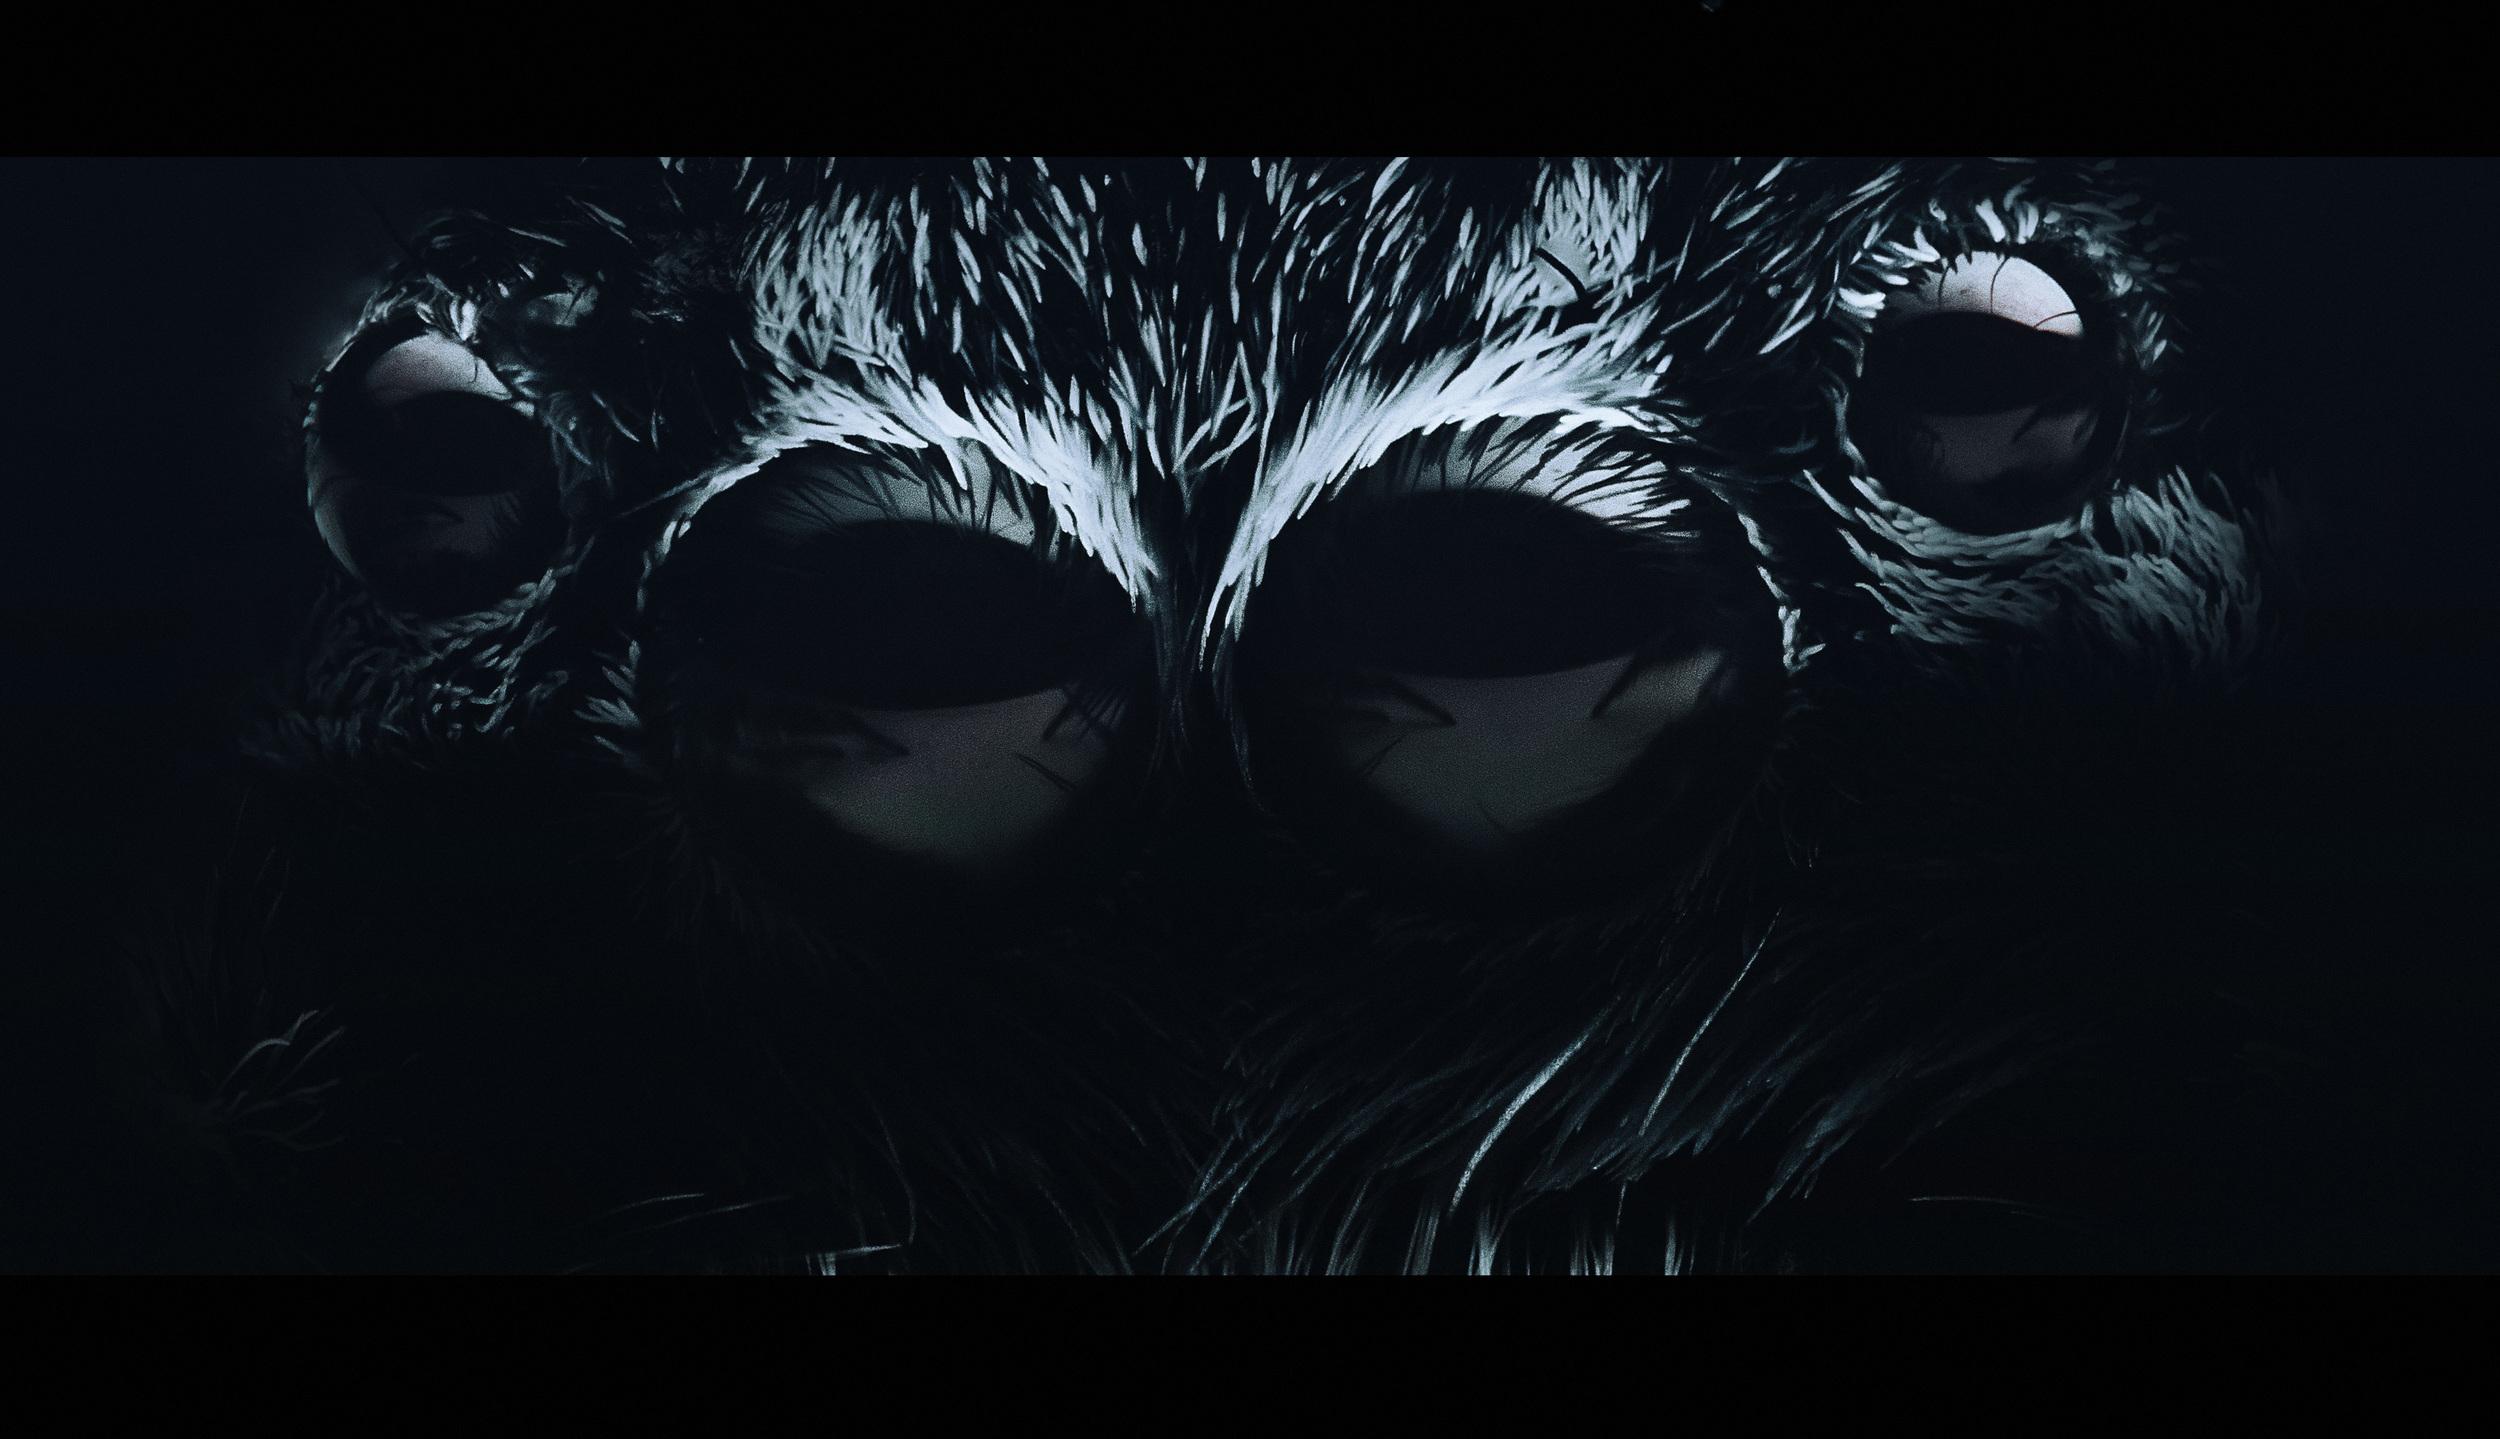 Lauren-Indovina-Penny-Dreadful-Titles-PSYOP-Concept-Art-Spider-Eyes.jpg